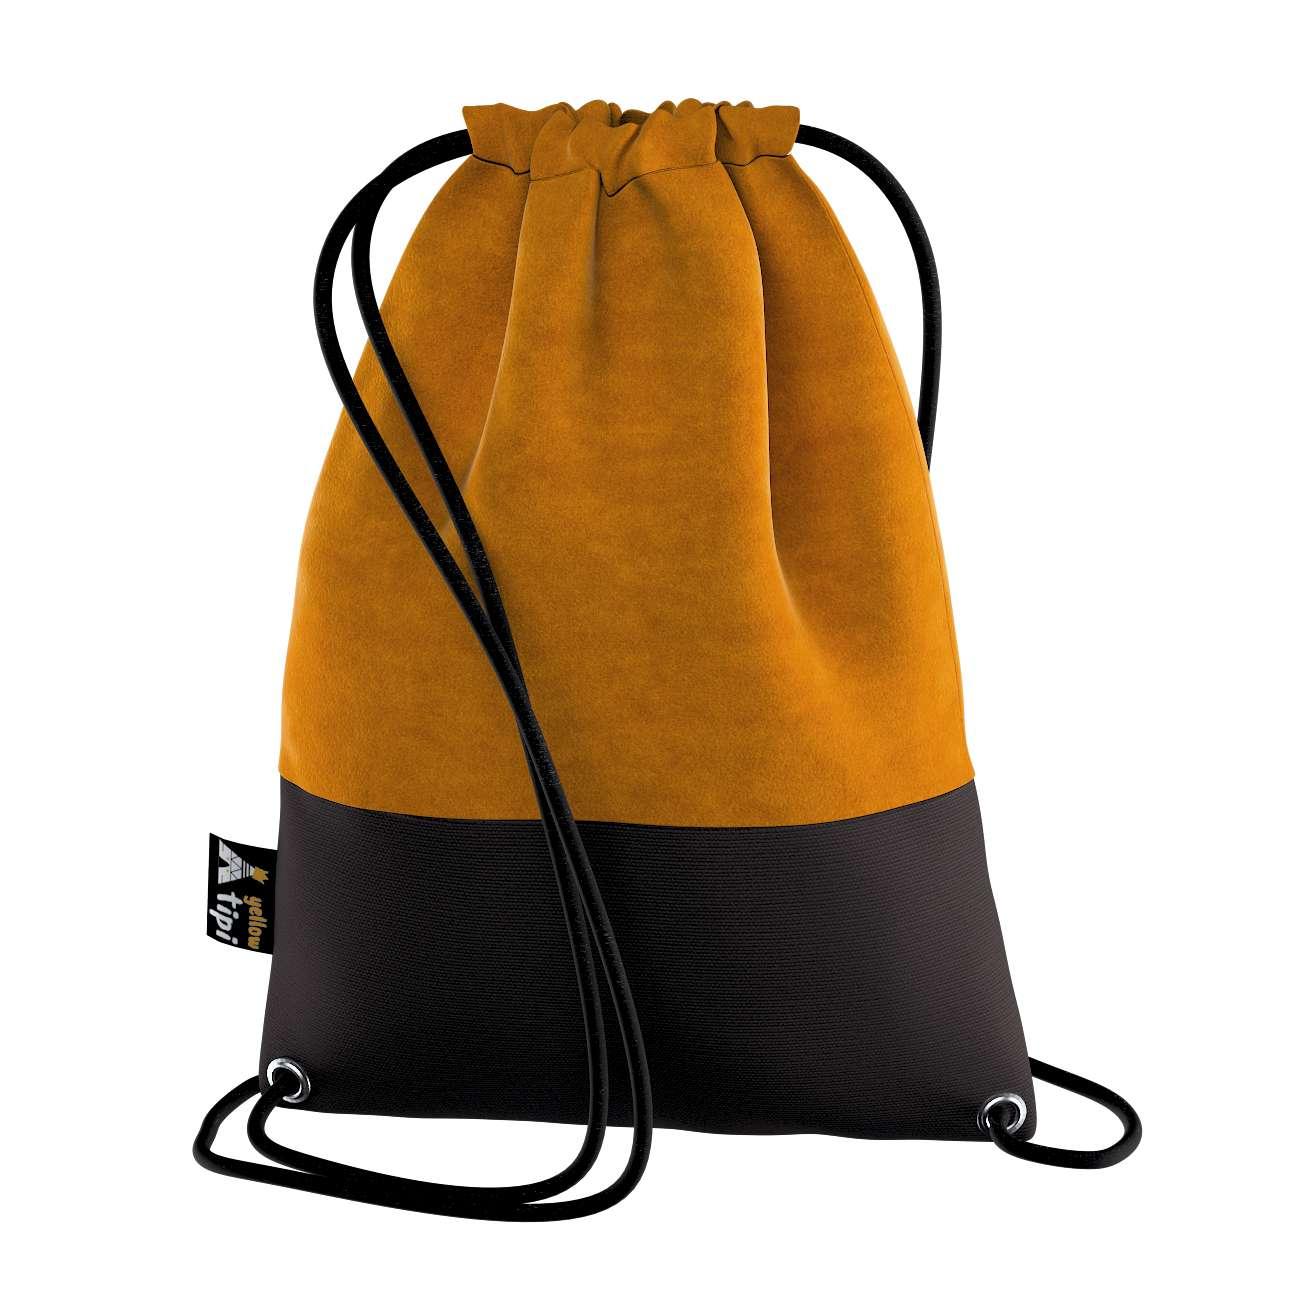 Kiddy Velvet krepšys kolekcijoje Posh Velvet, audinys: 704-23